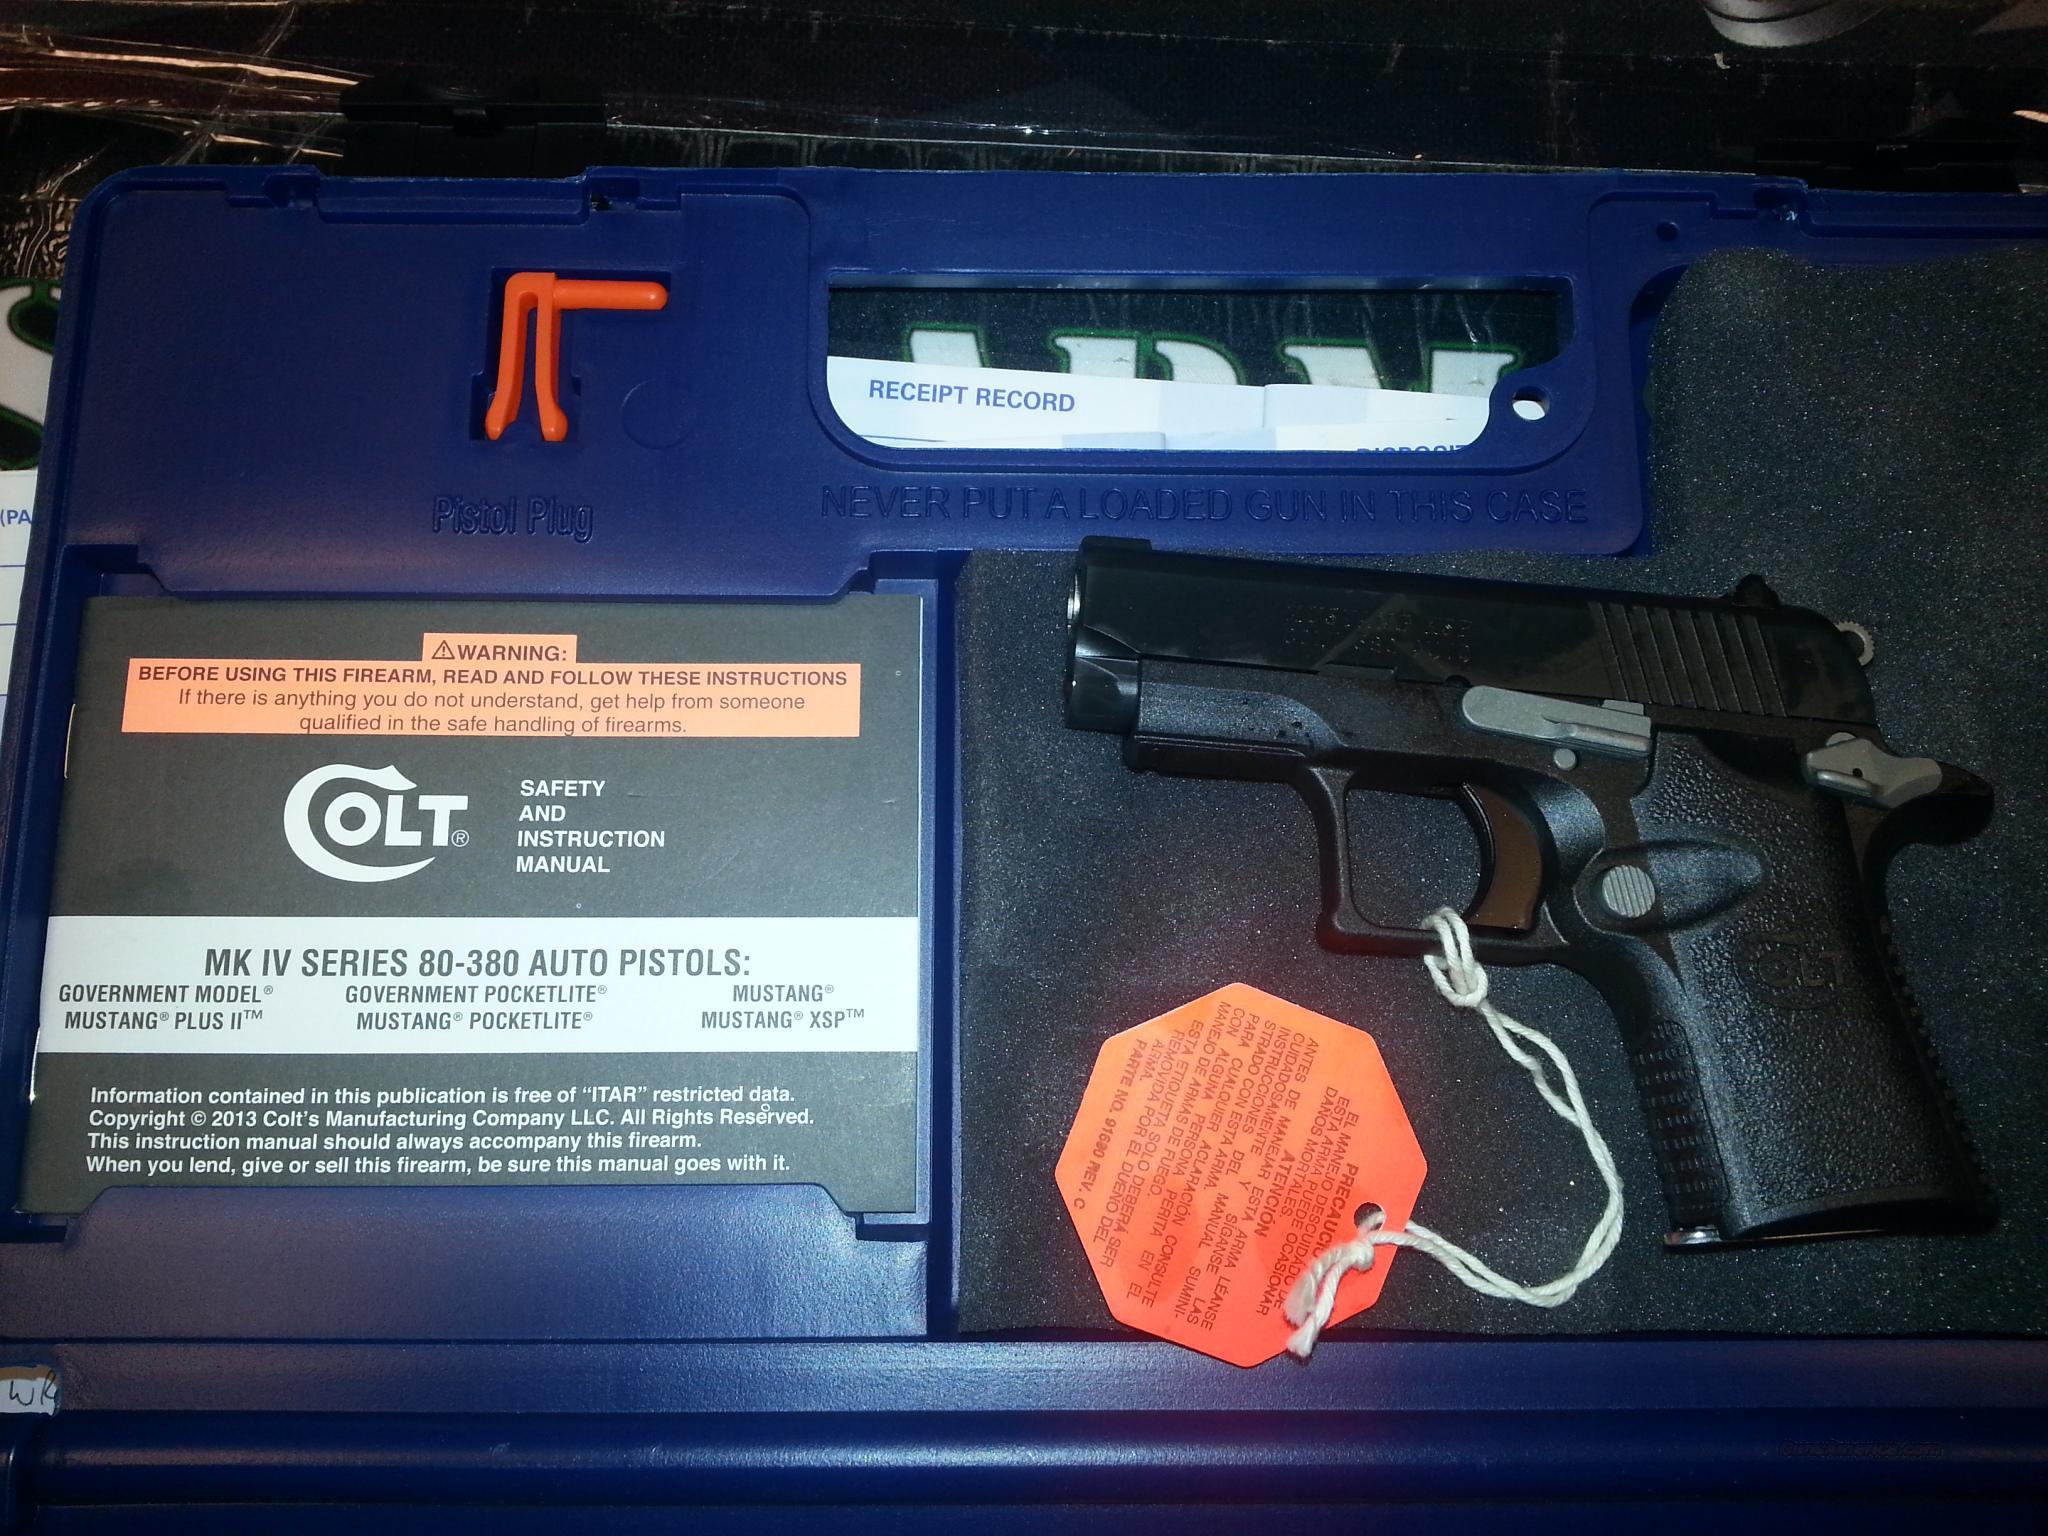 Colt Mustang XSP .380ACP  Guns > Pistols > Colt Automatic Pistols (1911 & Var)